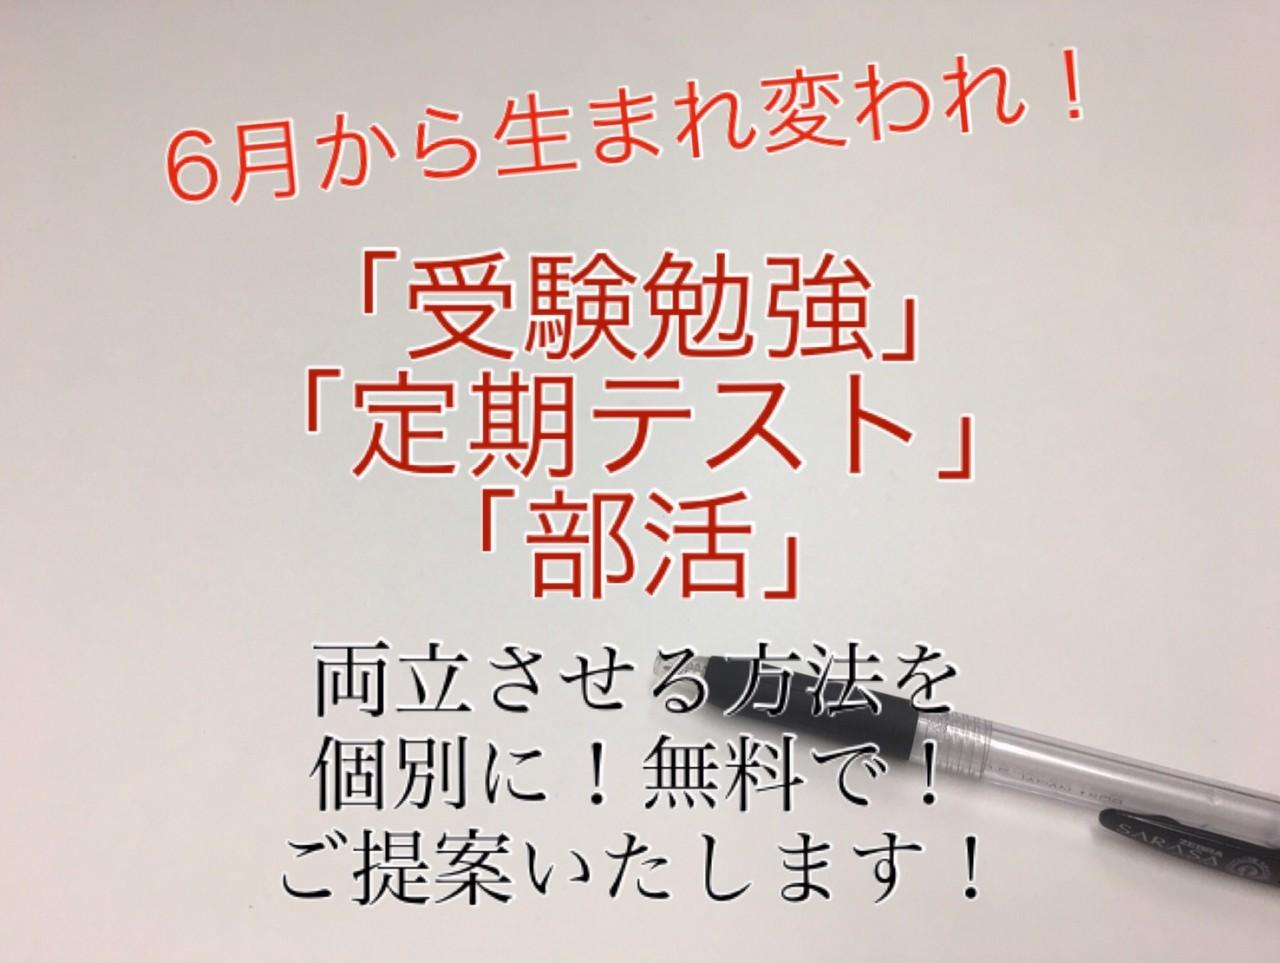 line_oa_chat_200530_202849